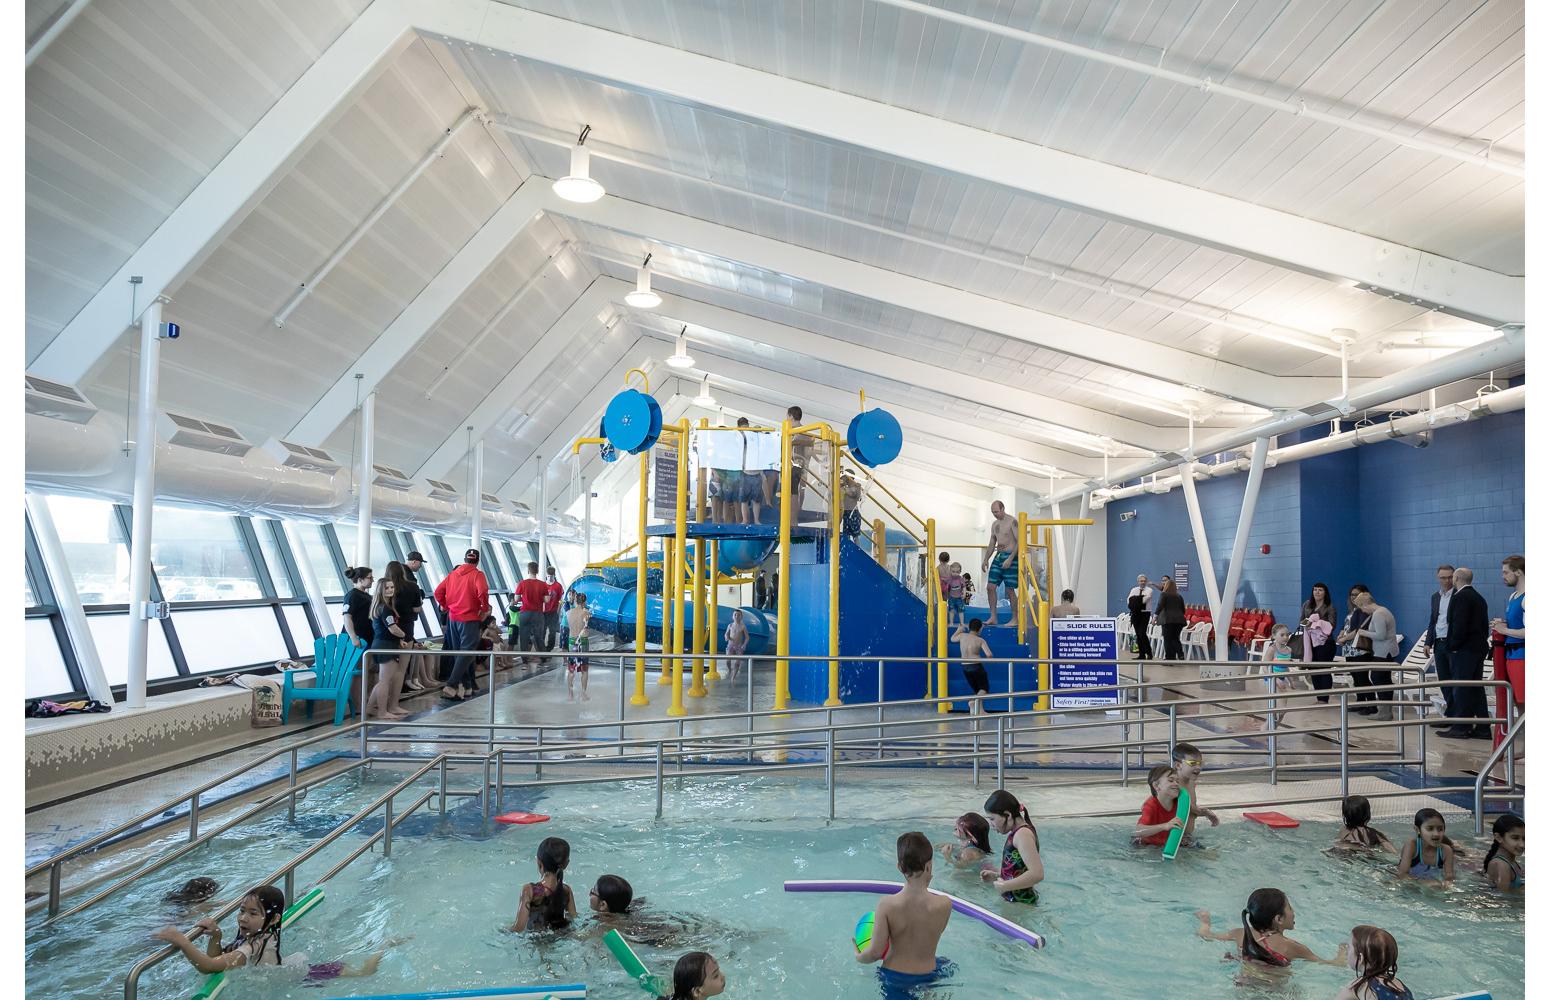 Seven Oaks Pool Grand Opening - Splash pad